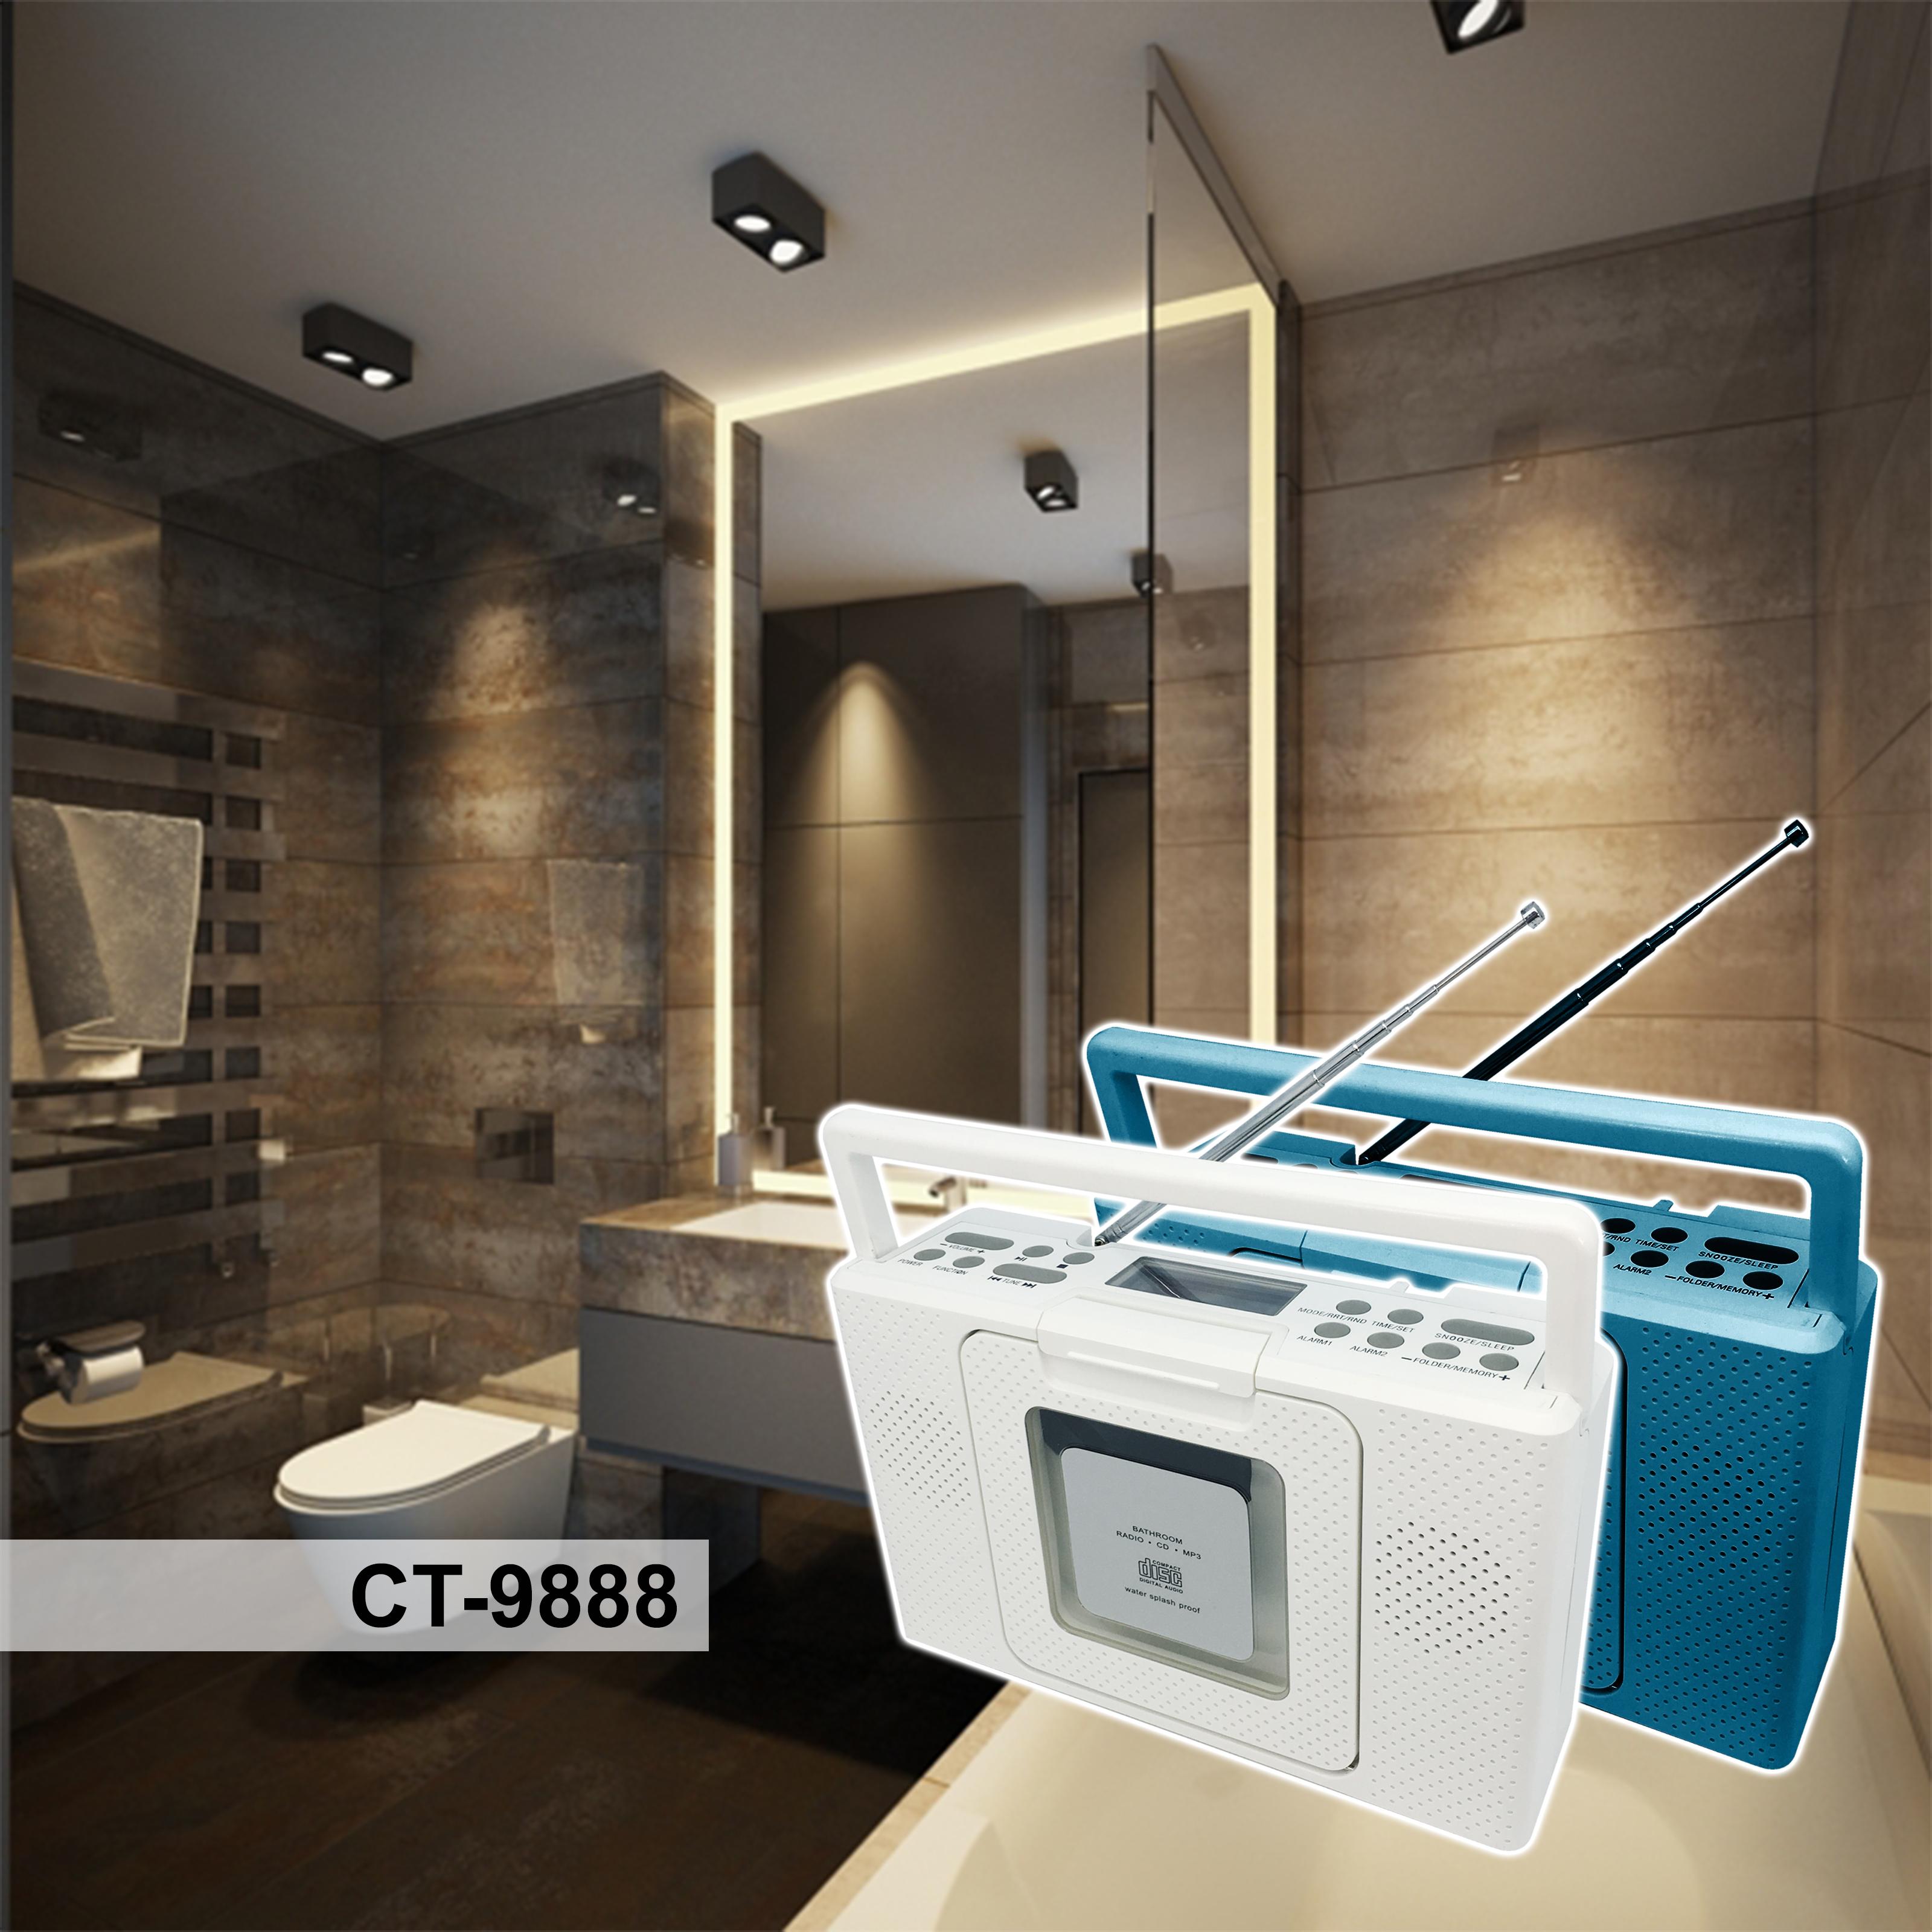 CT-9888 bathroom B.jpg